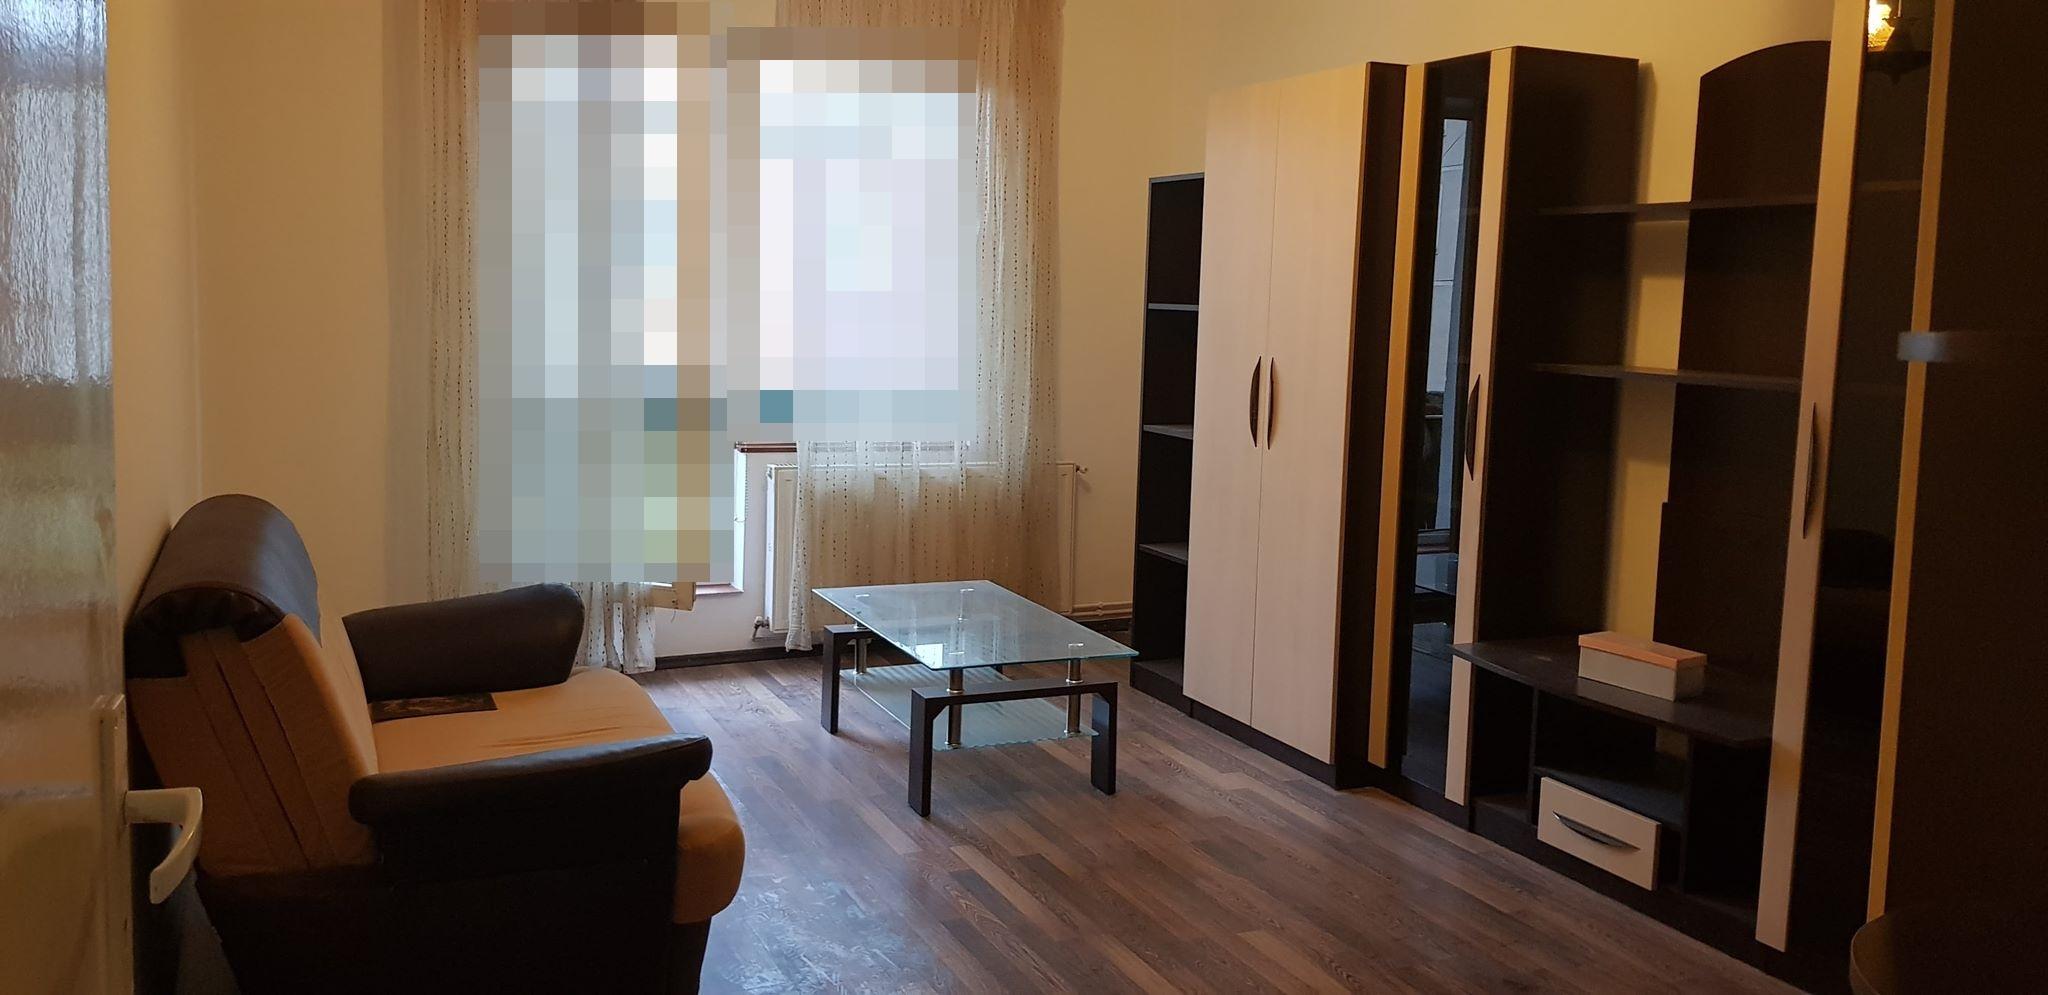 Apartament 2 camere decomandat de vanzare,Targu Mures cartierul 7 Noiembrie